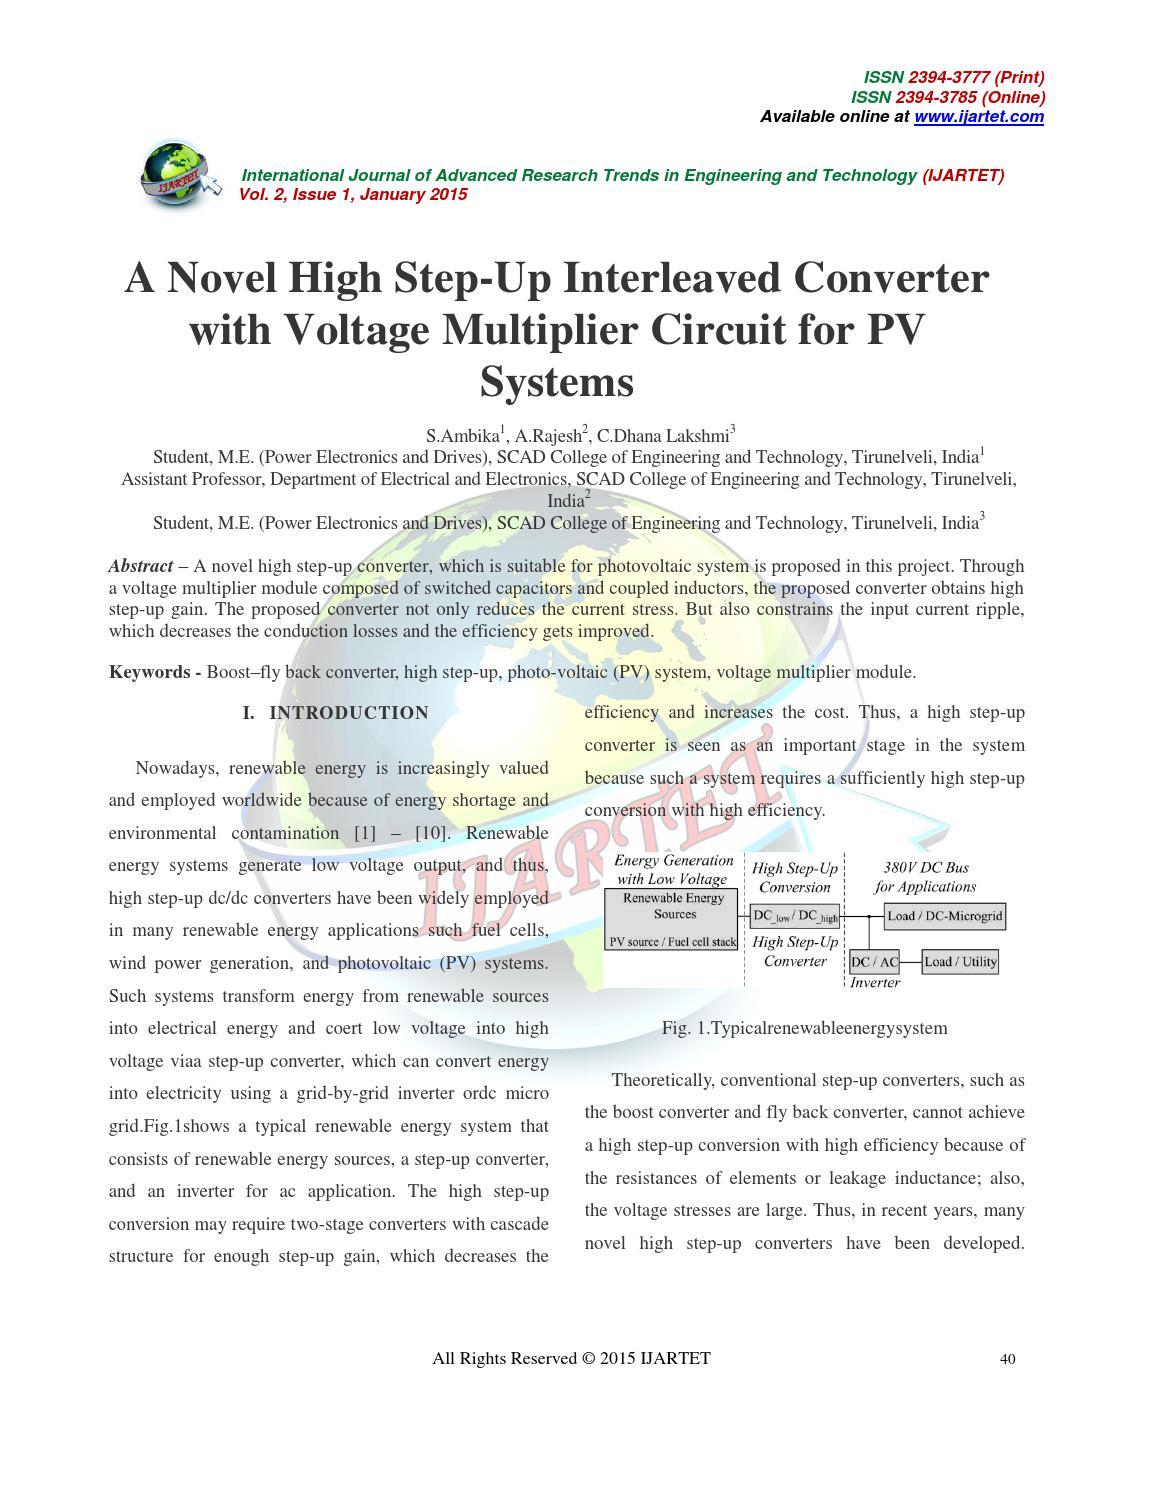 A Novel High Step Up Interleaved Converter By Ijartet Issuu Voltage Multiplier Circuit On Dc